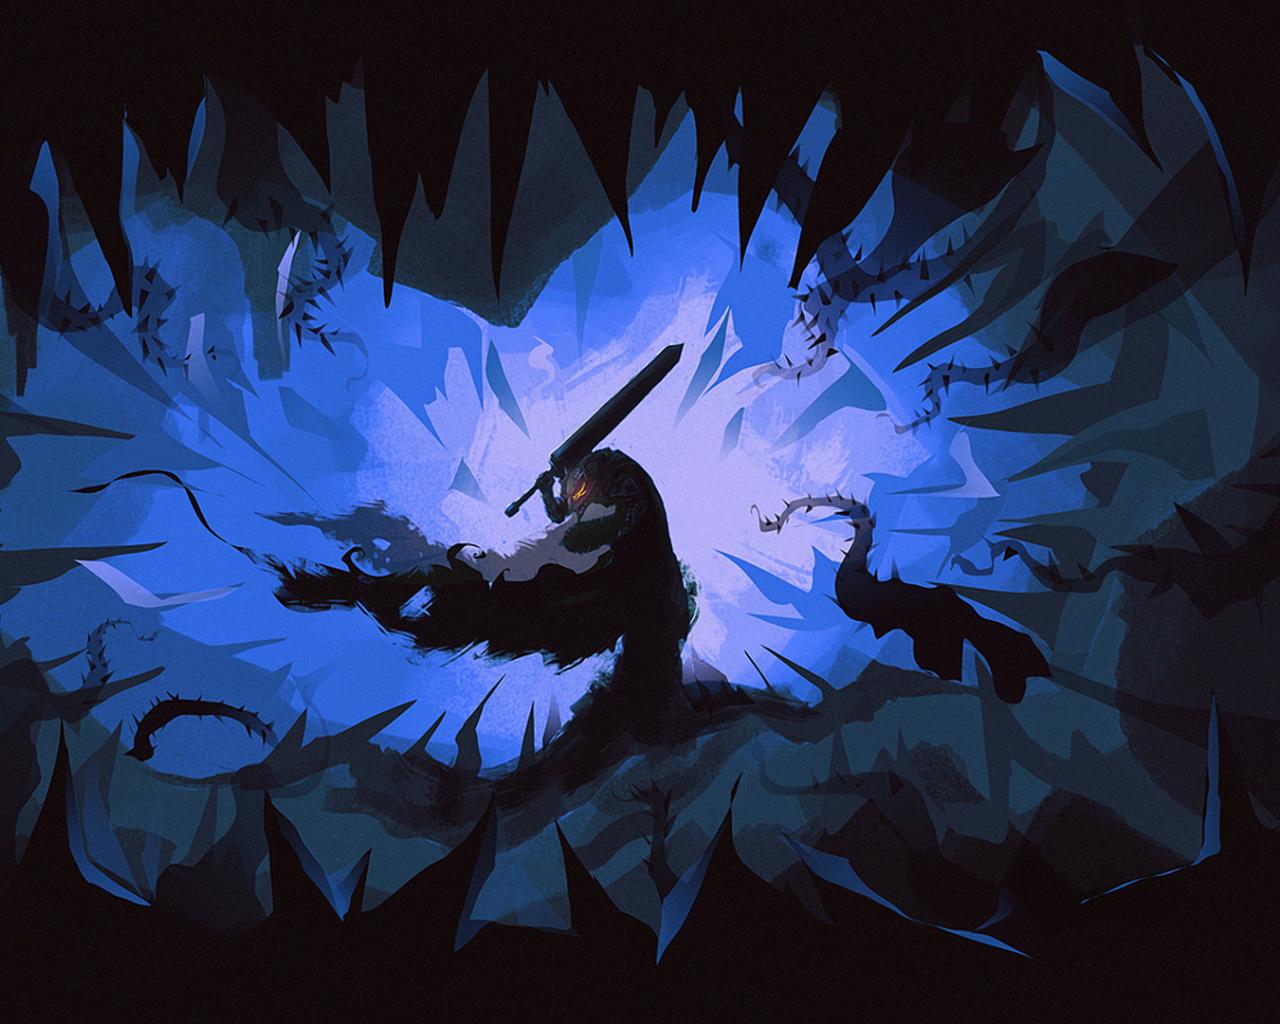 Desktop Wallpaper Guts Of Berserk Anime Wallpaper Hd Image Picture Background Kuld7s